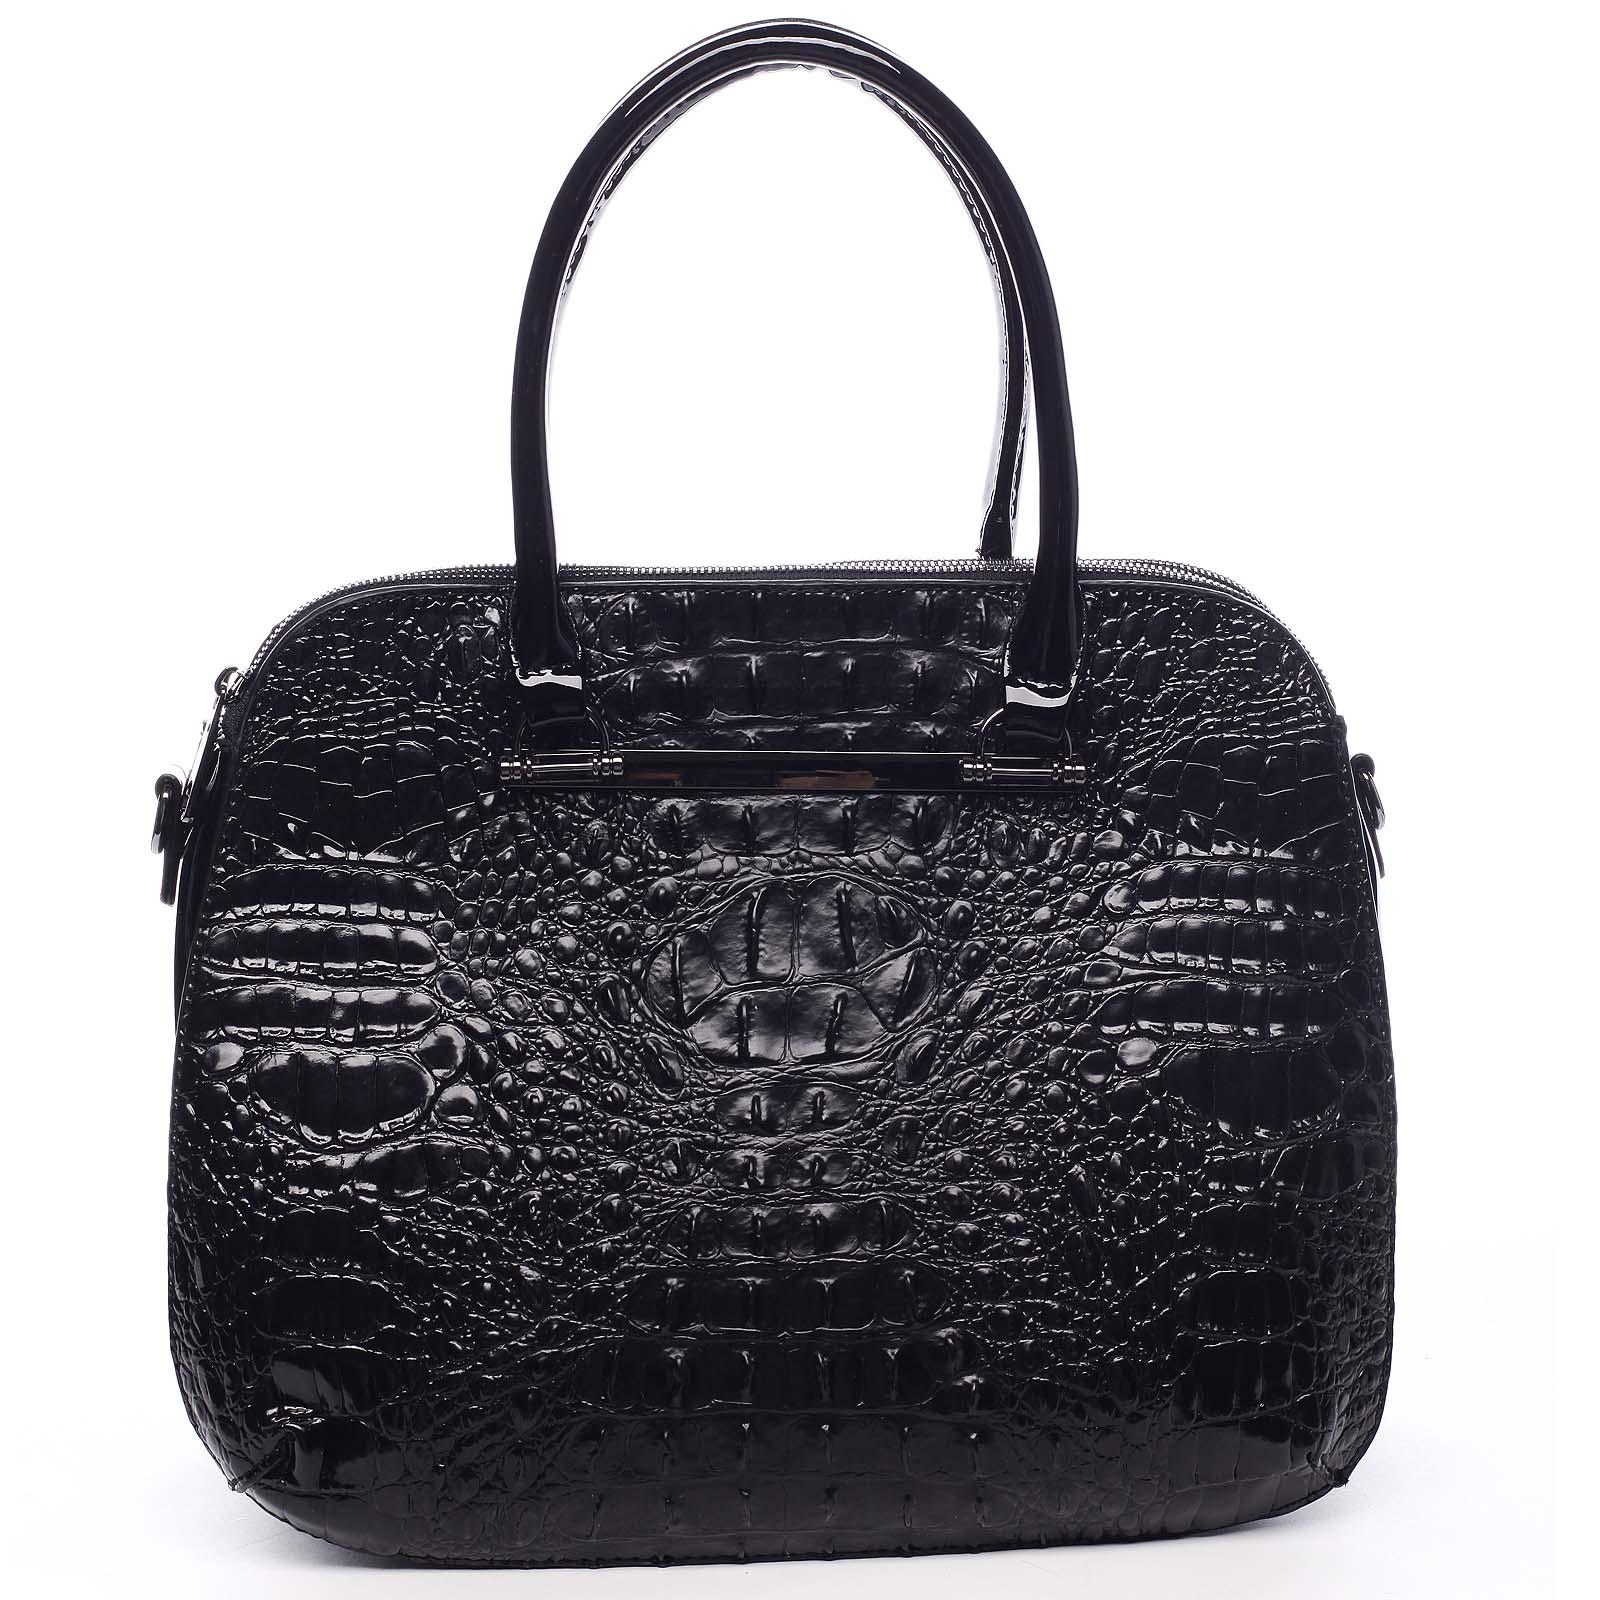 Dámská kabelka do ruky černá - Dudlin Lexi